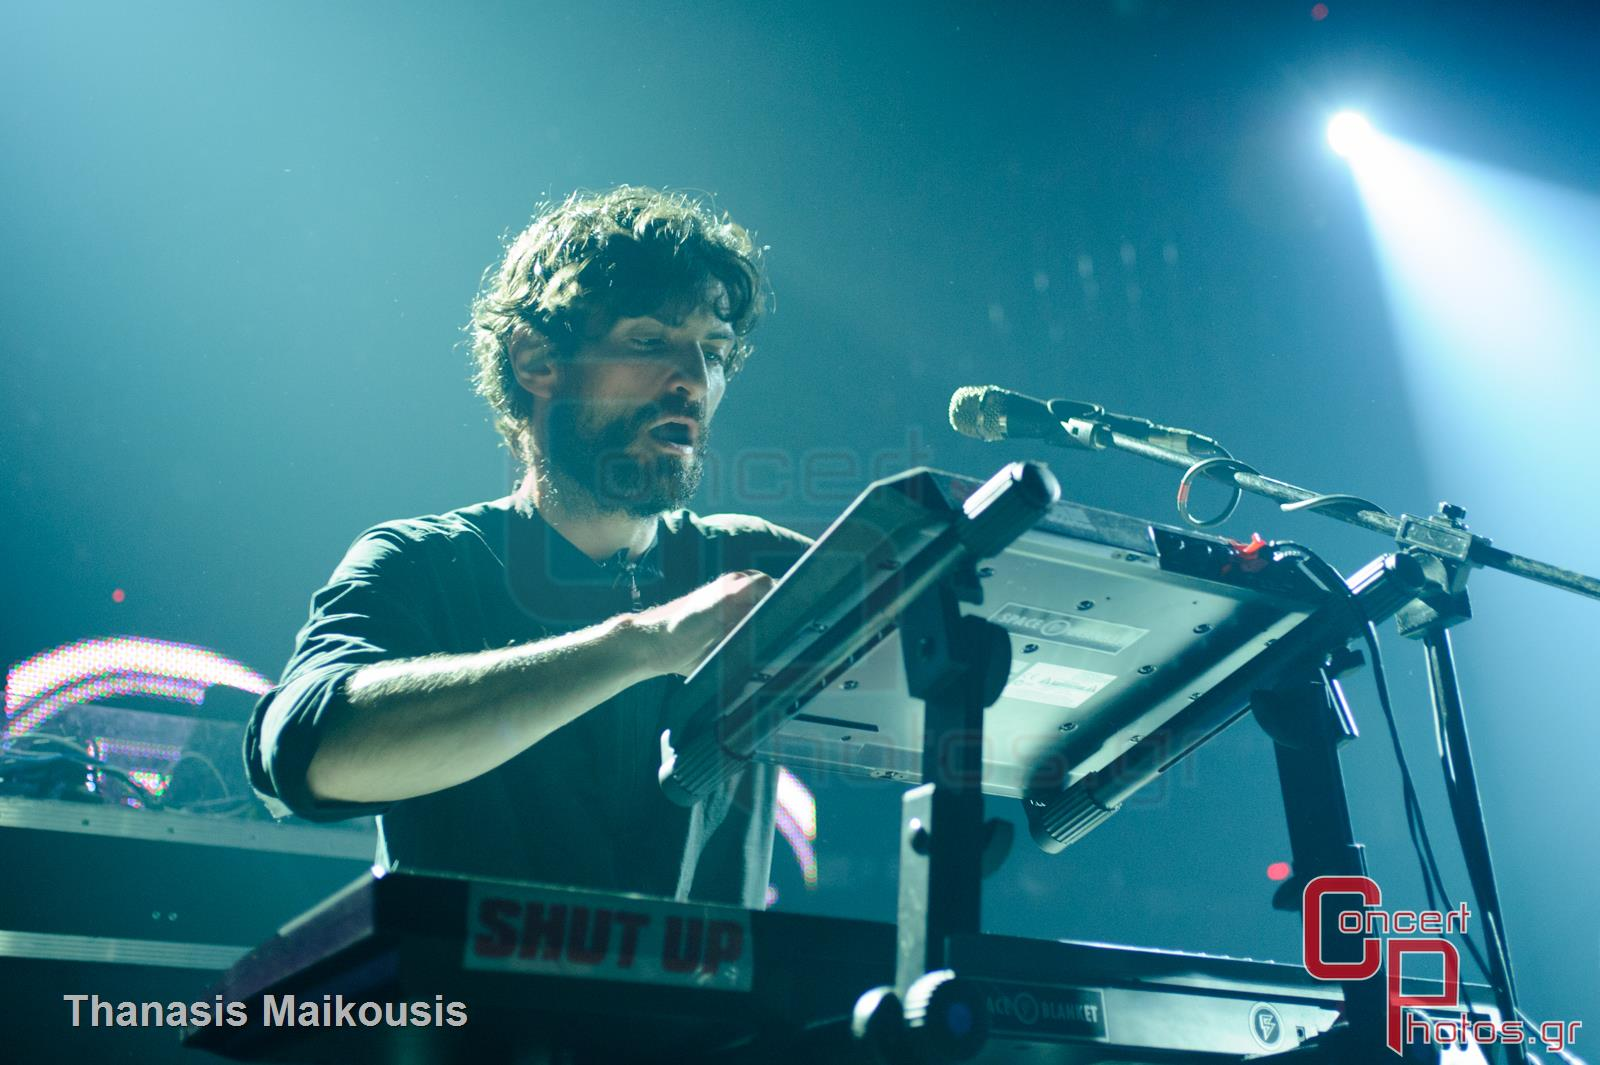 Gramatik-Gramatik Votanikos 2013 photographer: Thanasis Maikousis - ConcertPhotos-5255